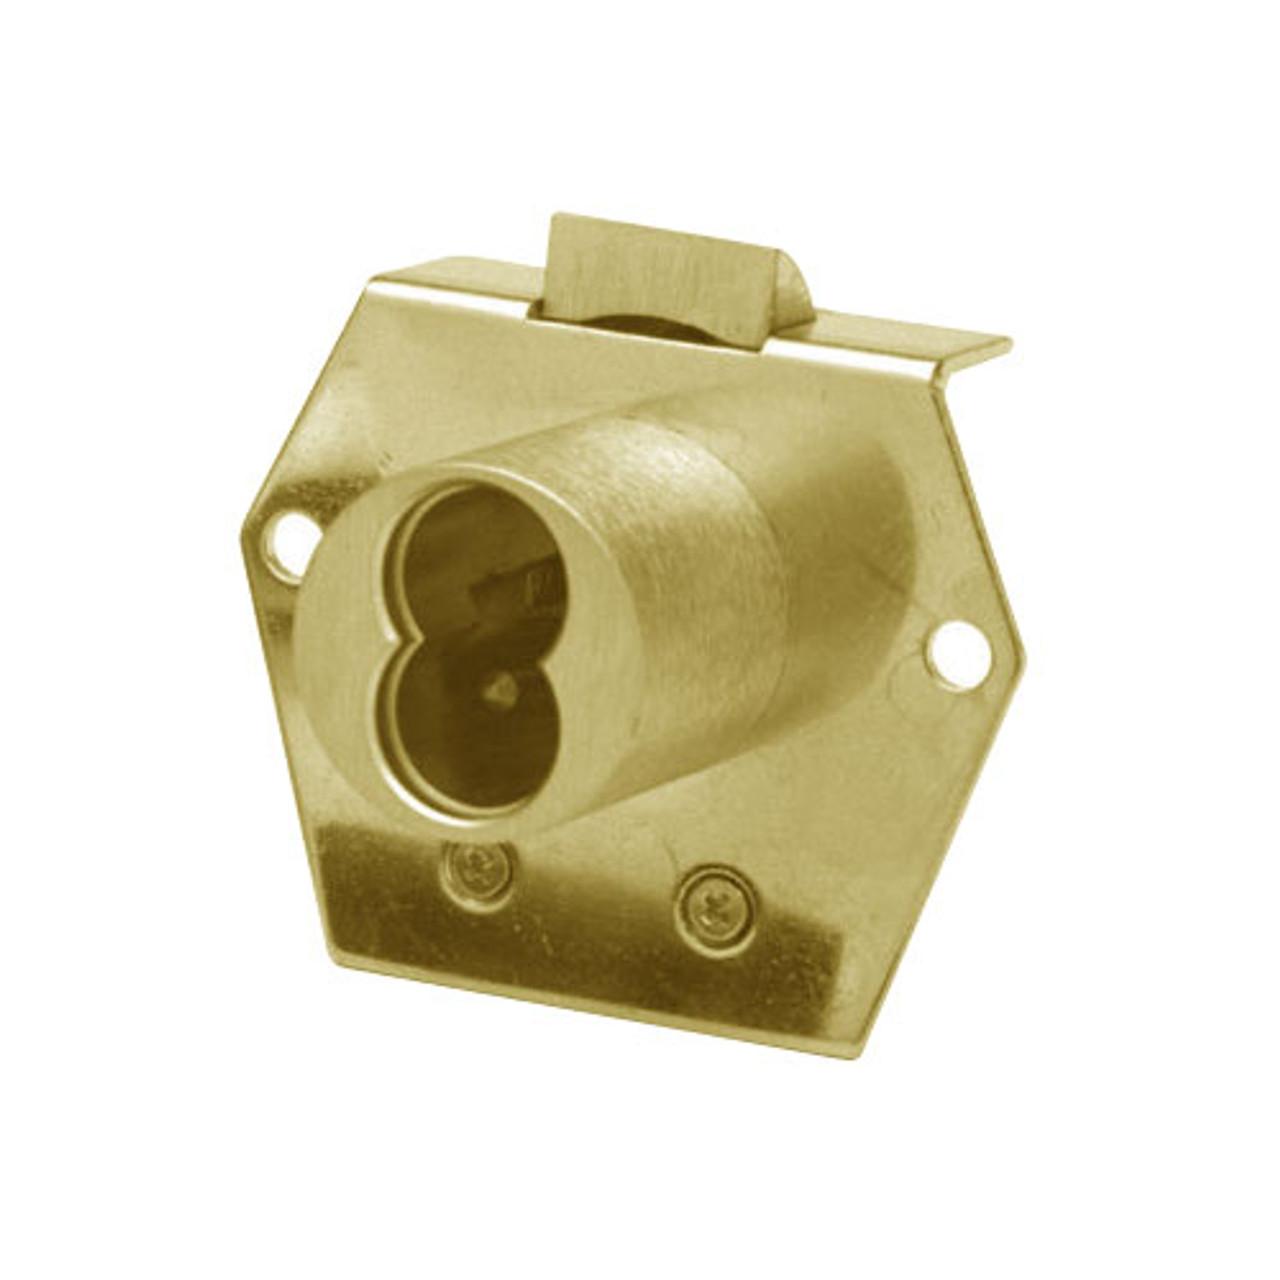 Olympus 725RL-DR-RH-US3 Cabinet Locks in Bright Brass Finish